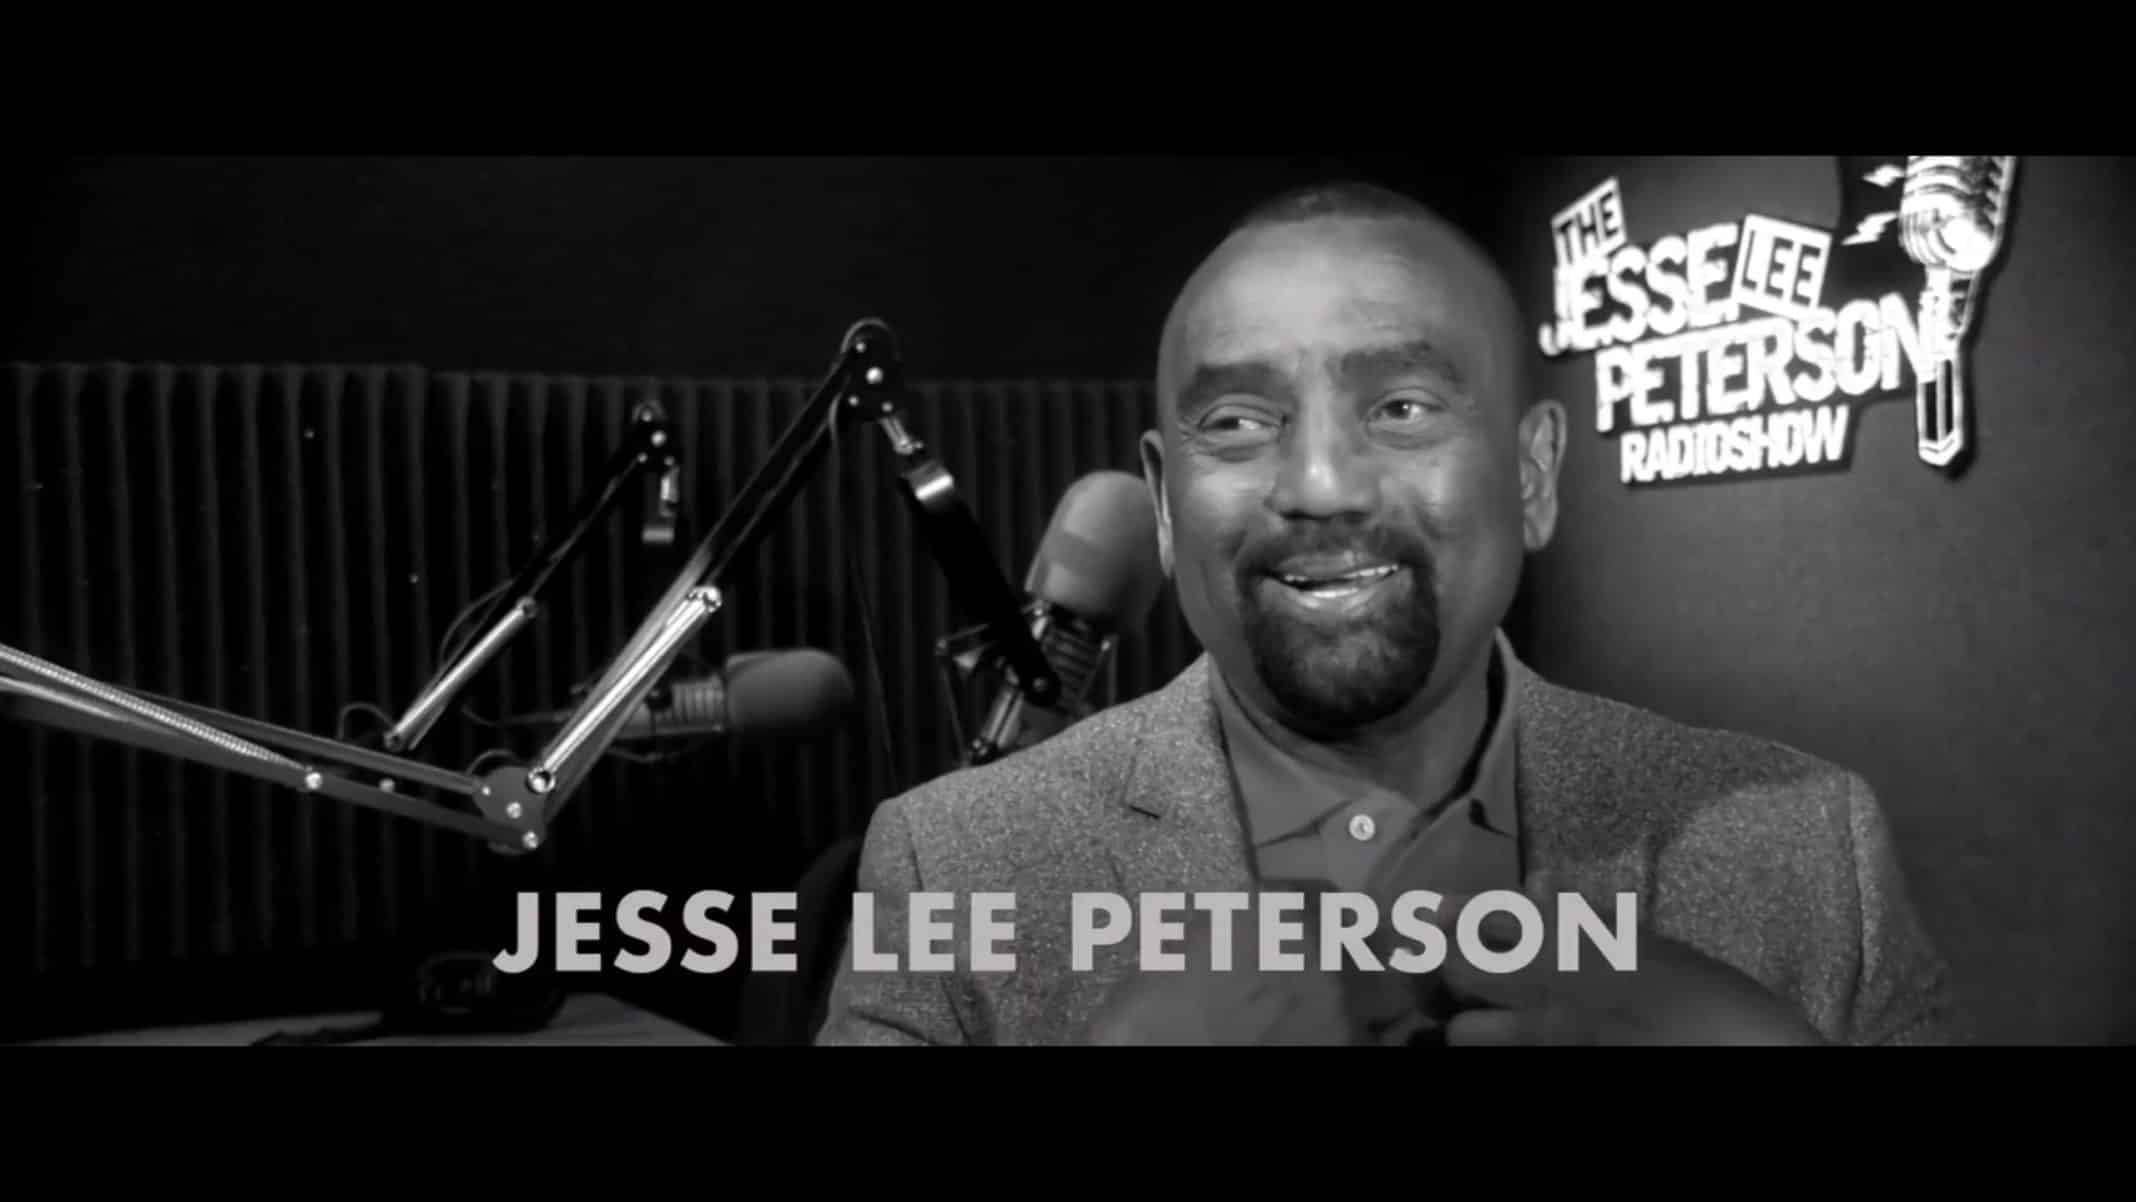 Jesse Lee Peterson being interviewed